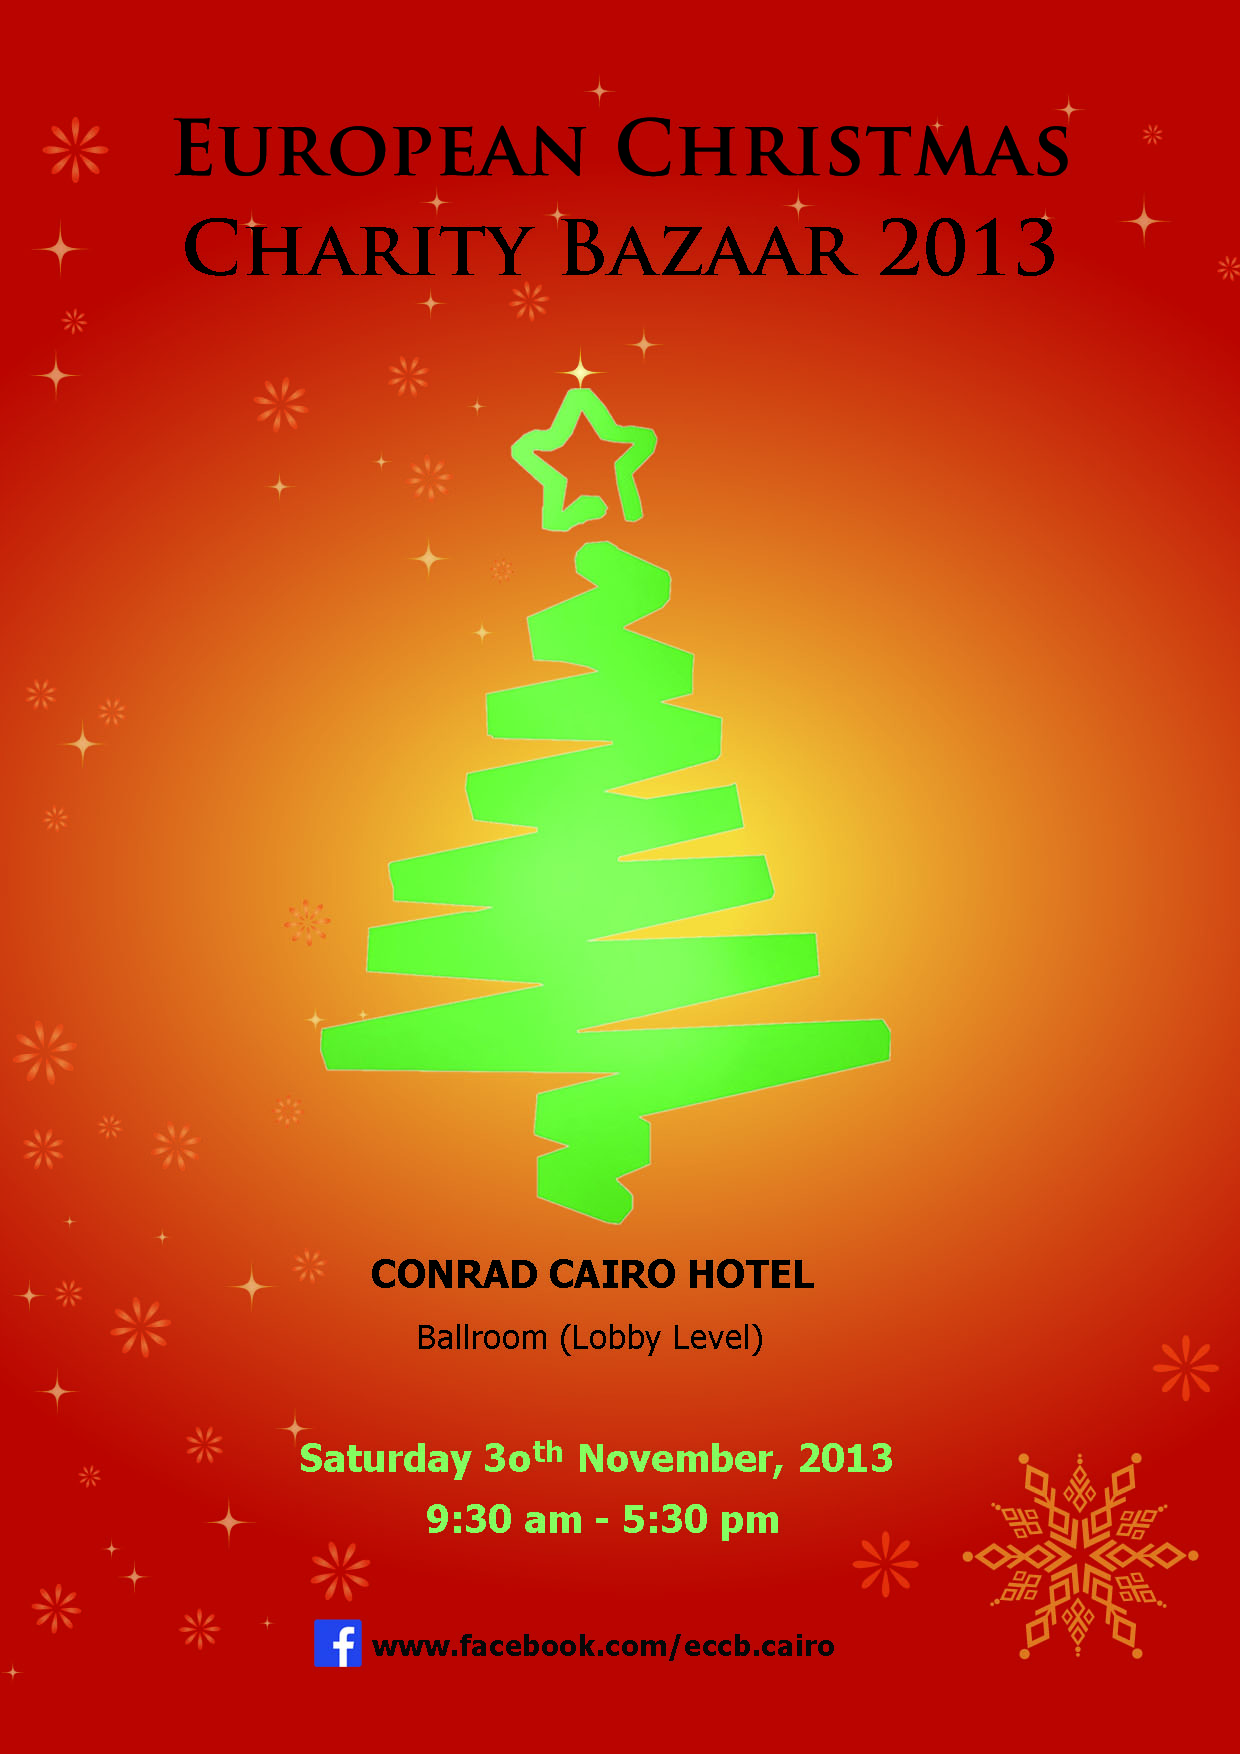 invitation to european christmas charity bazaar gov uk